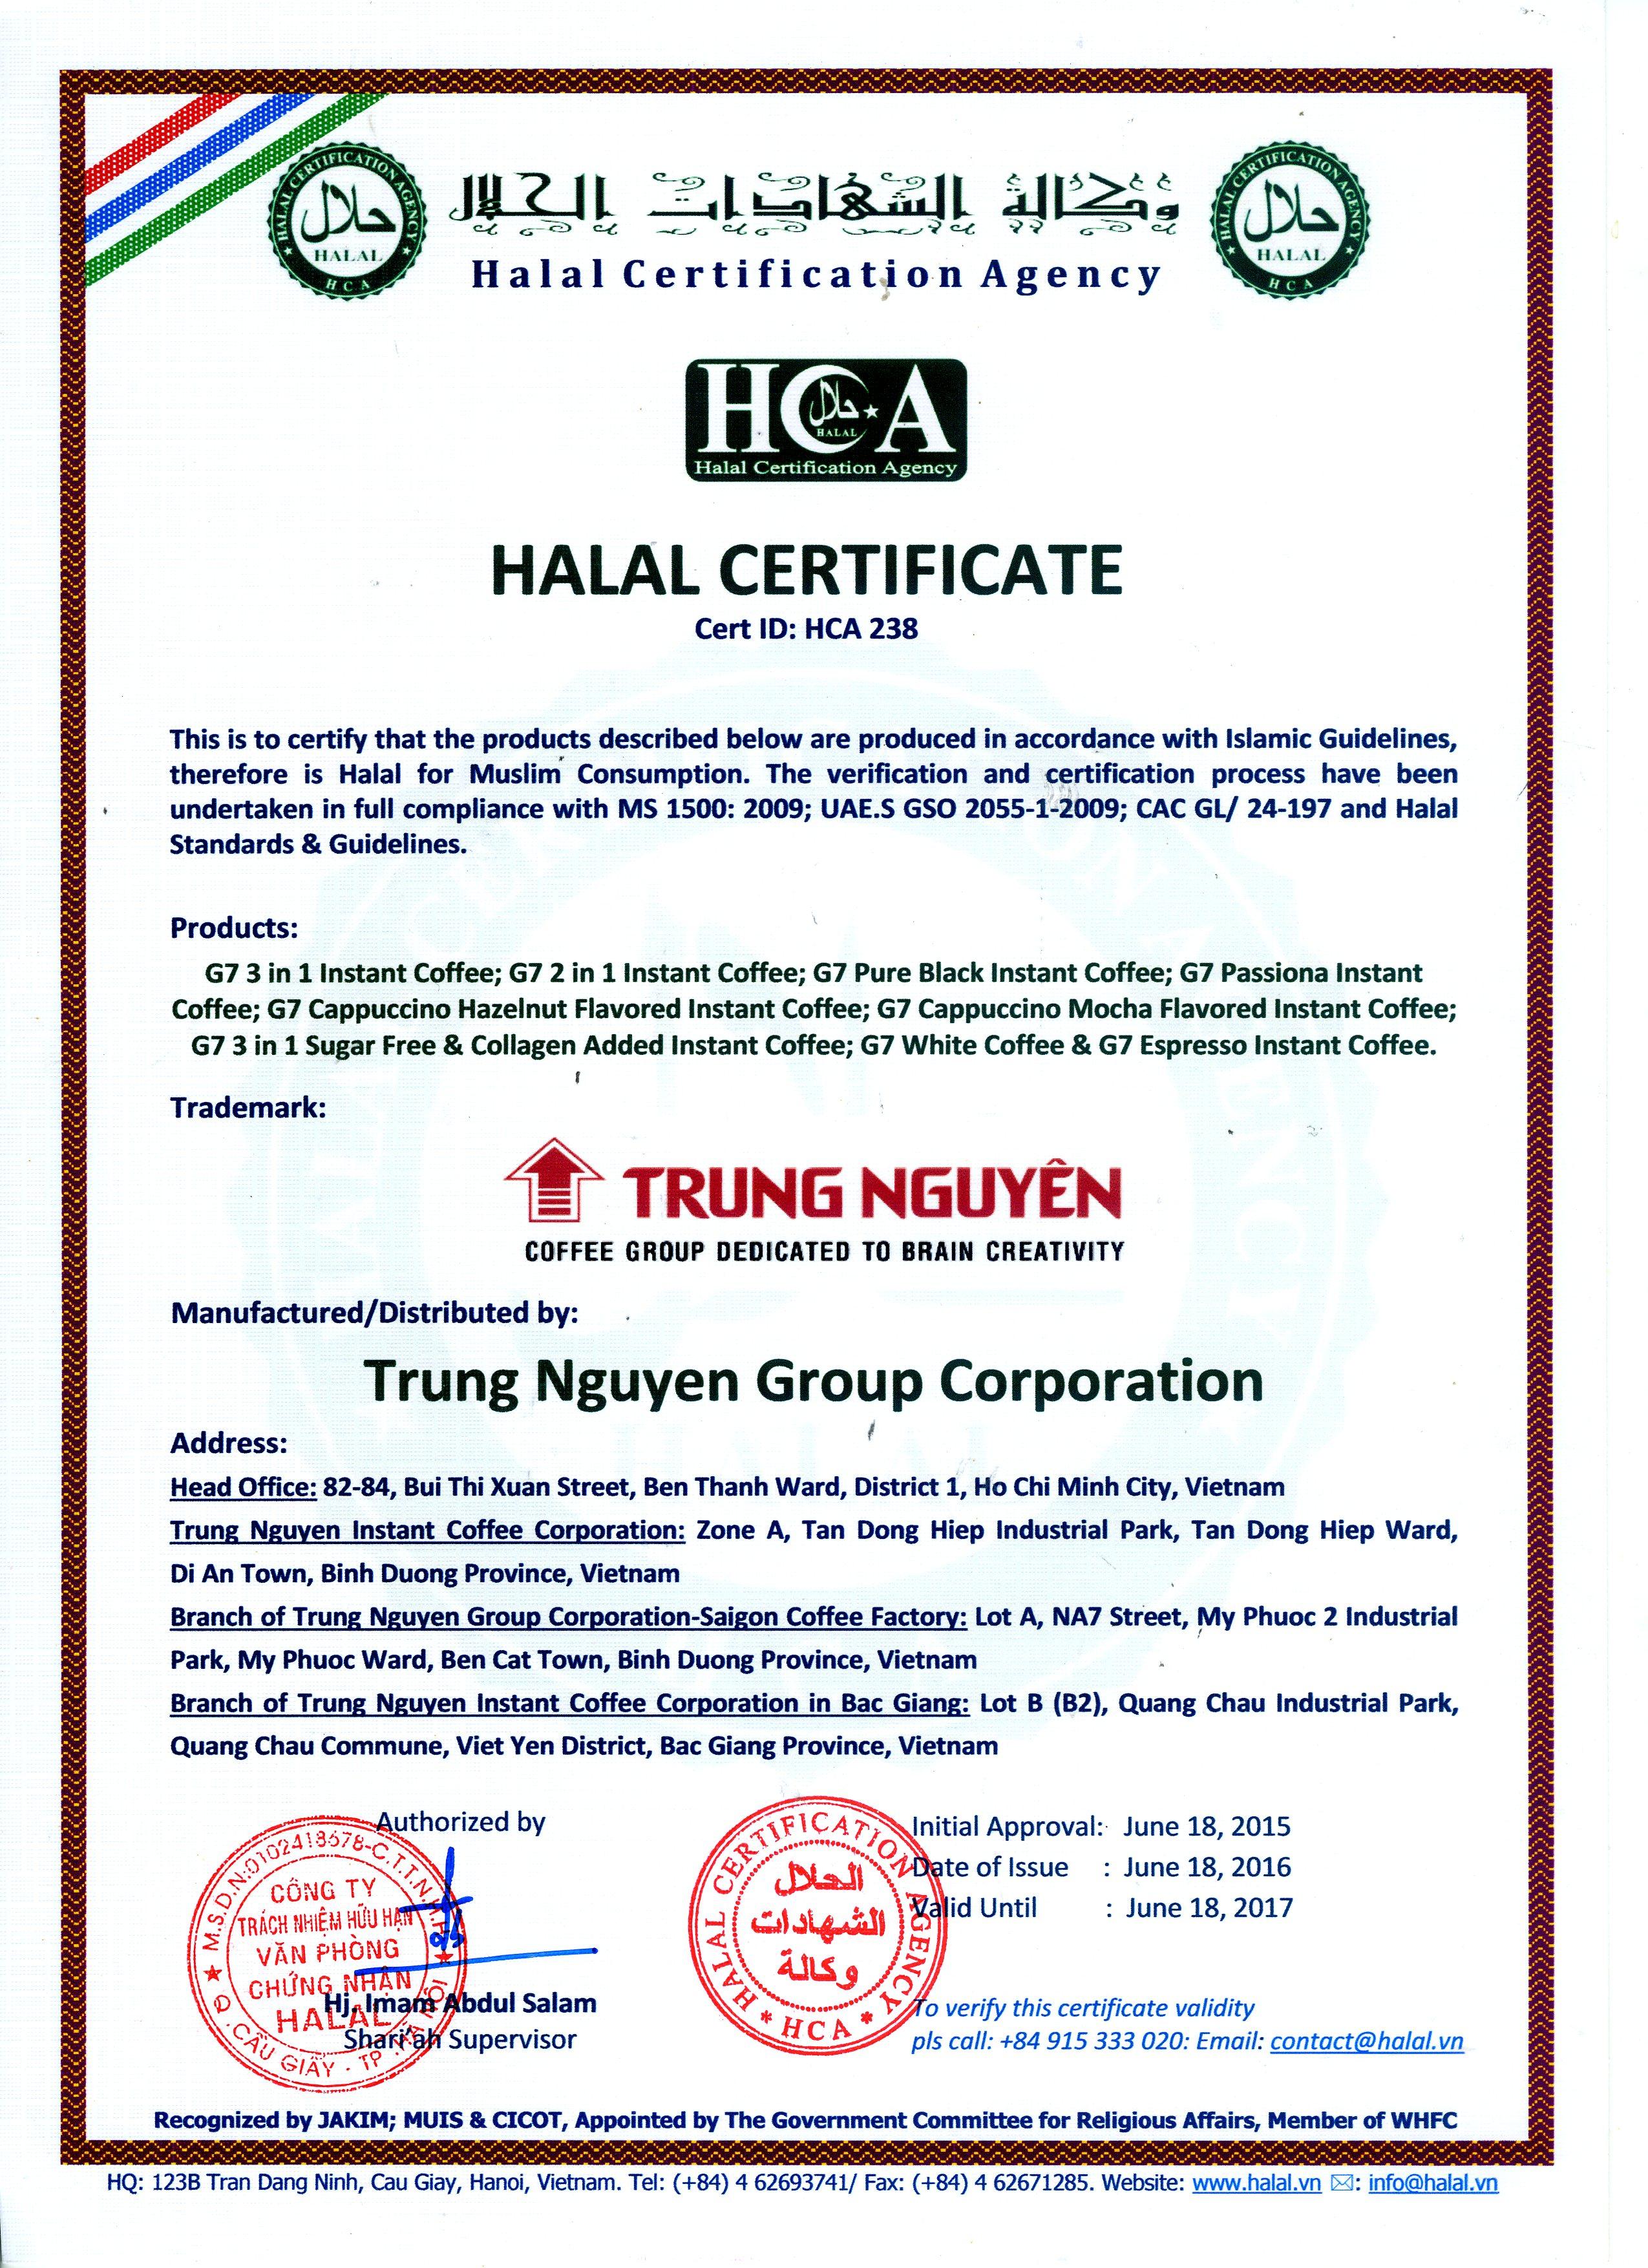 Chung nhan Halal